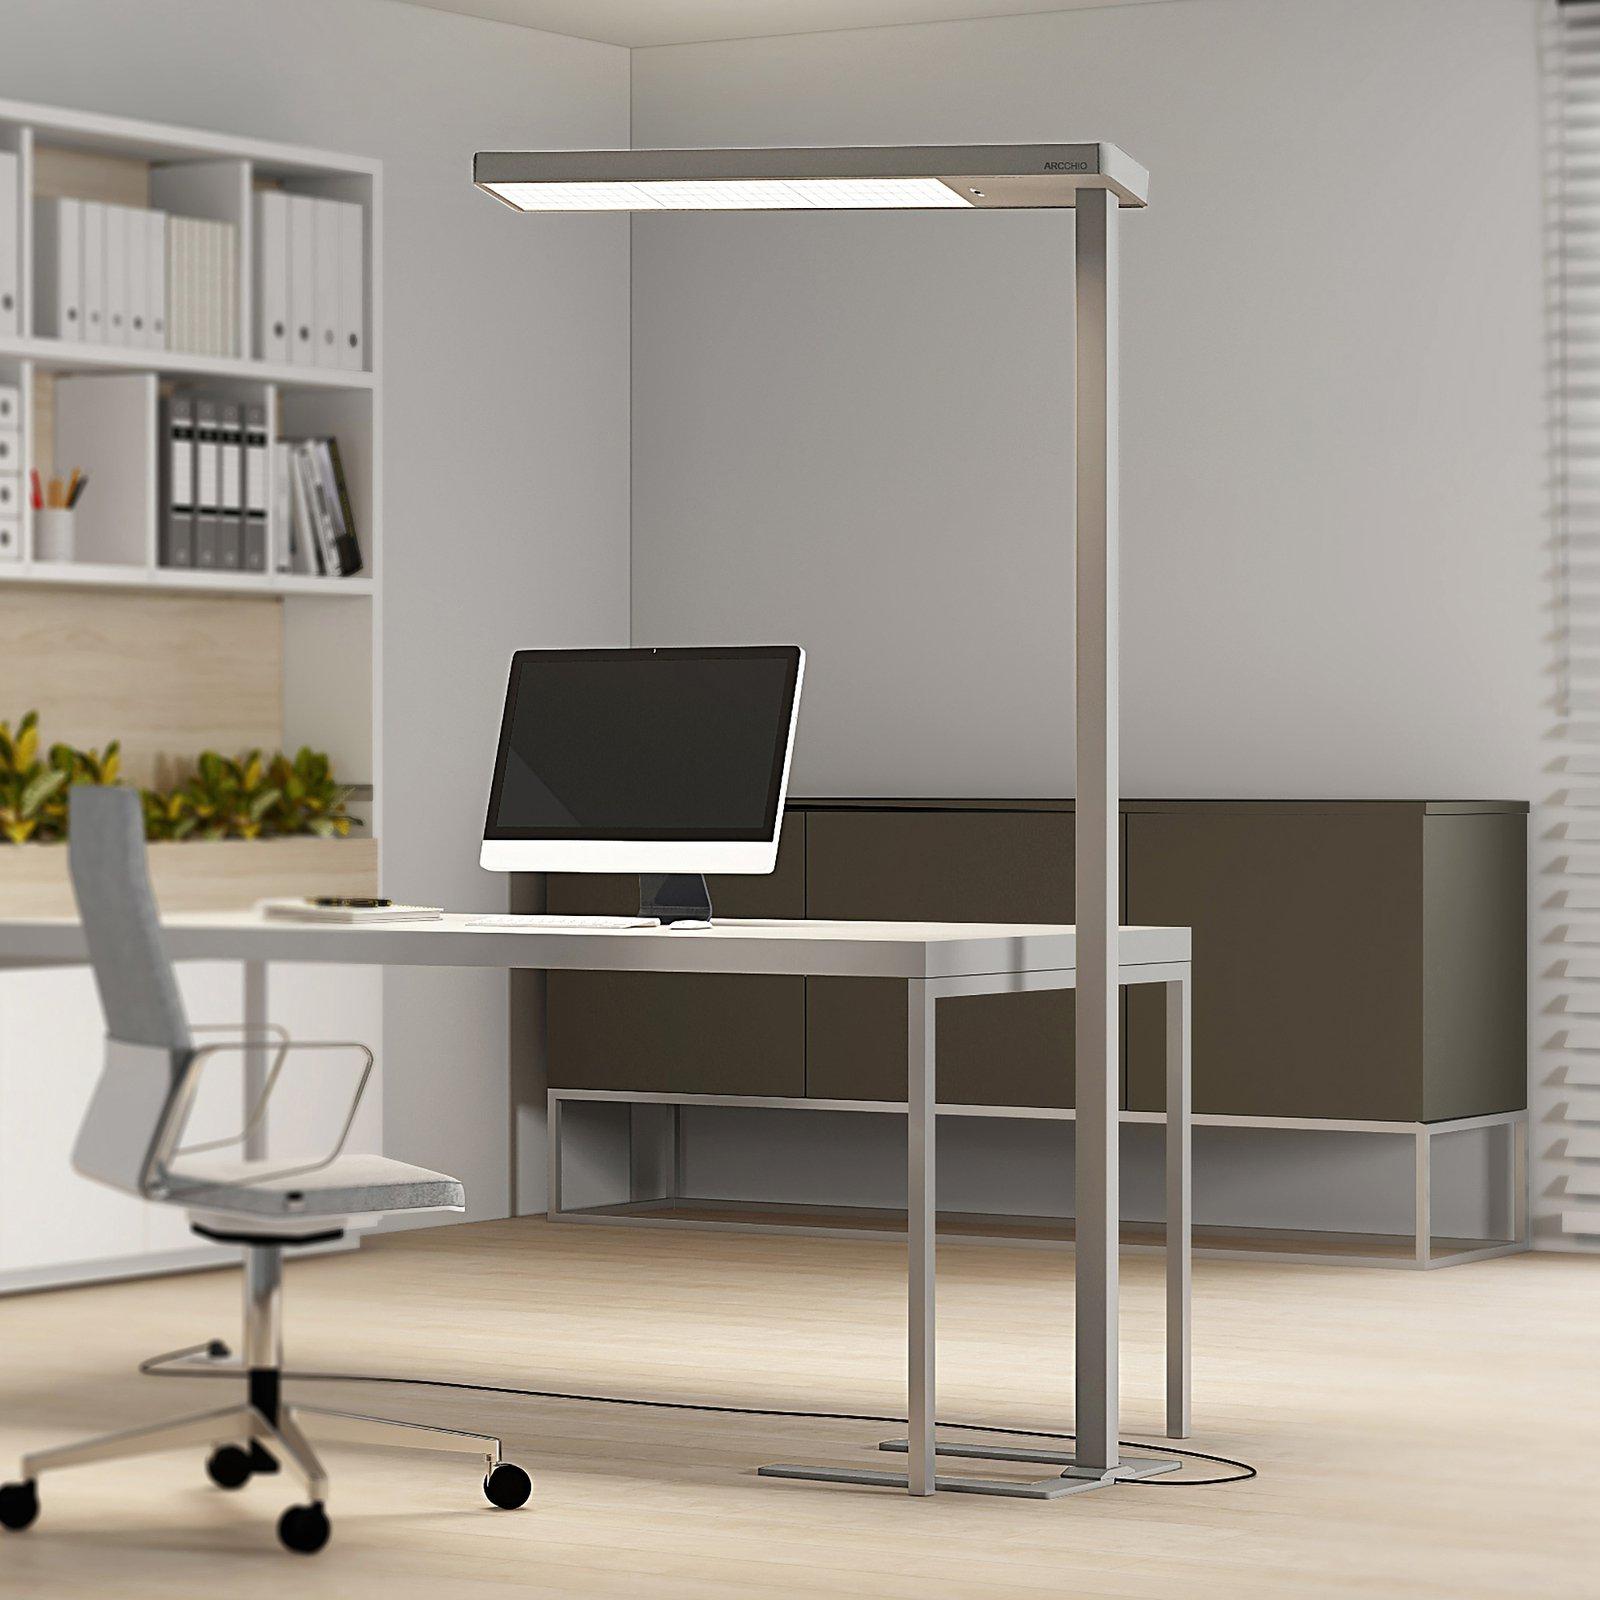 Arcchio Bilano LED-gulvlampe, dagslyssensor CCT